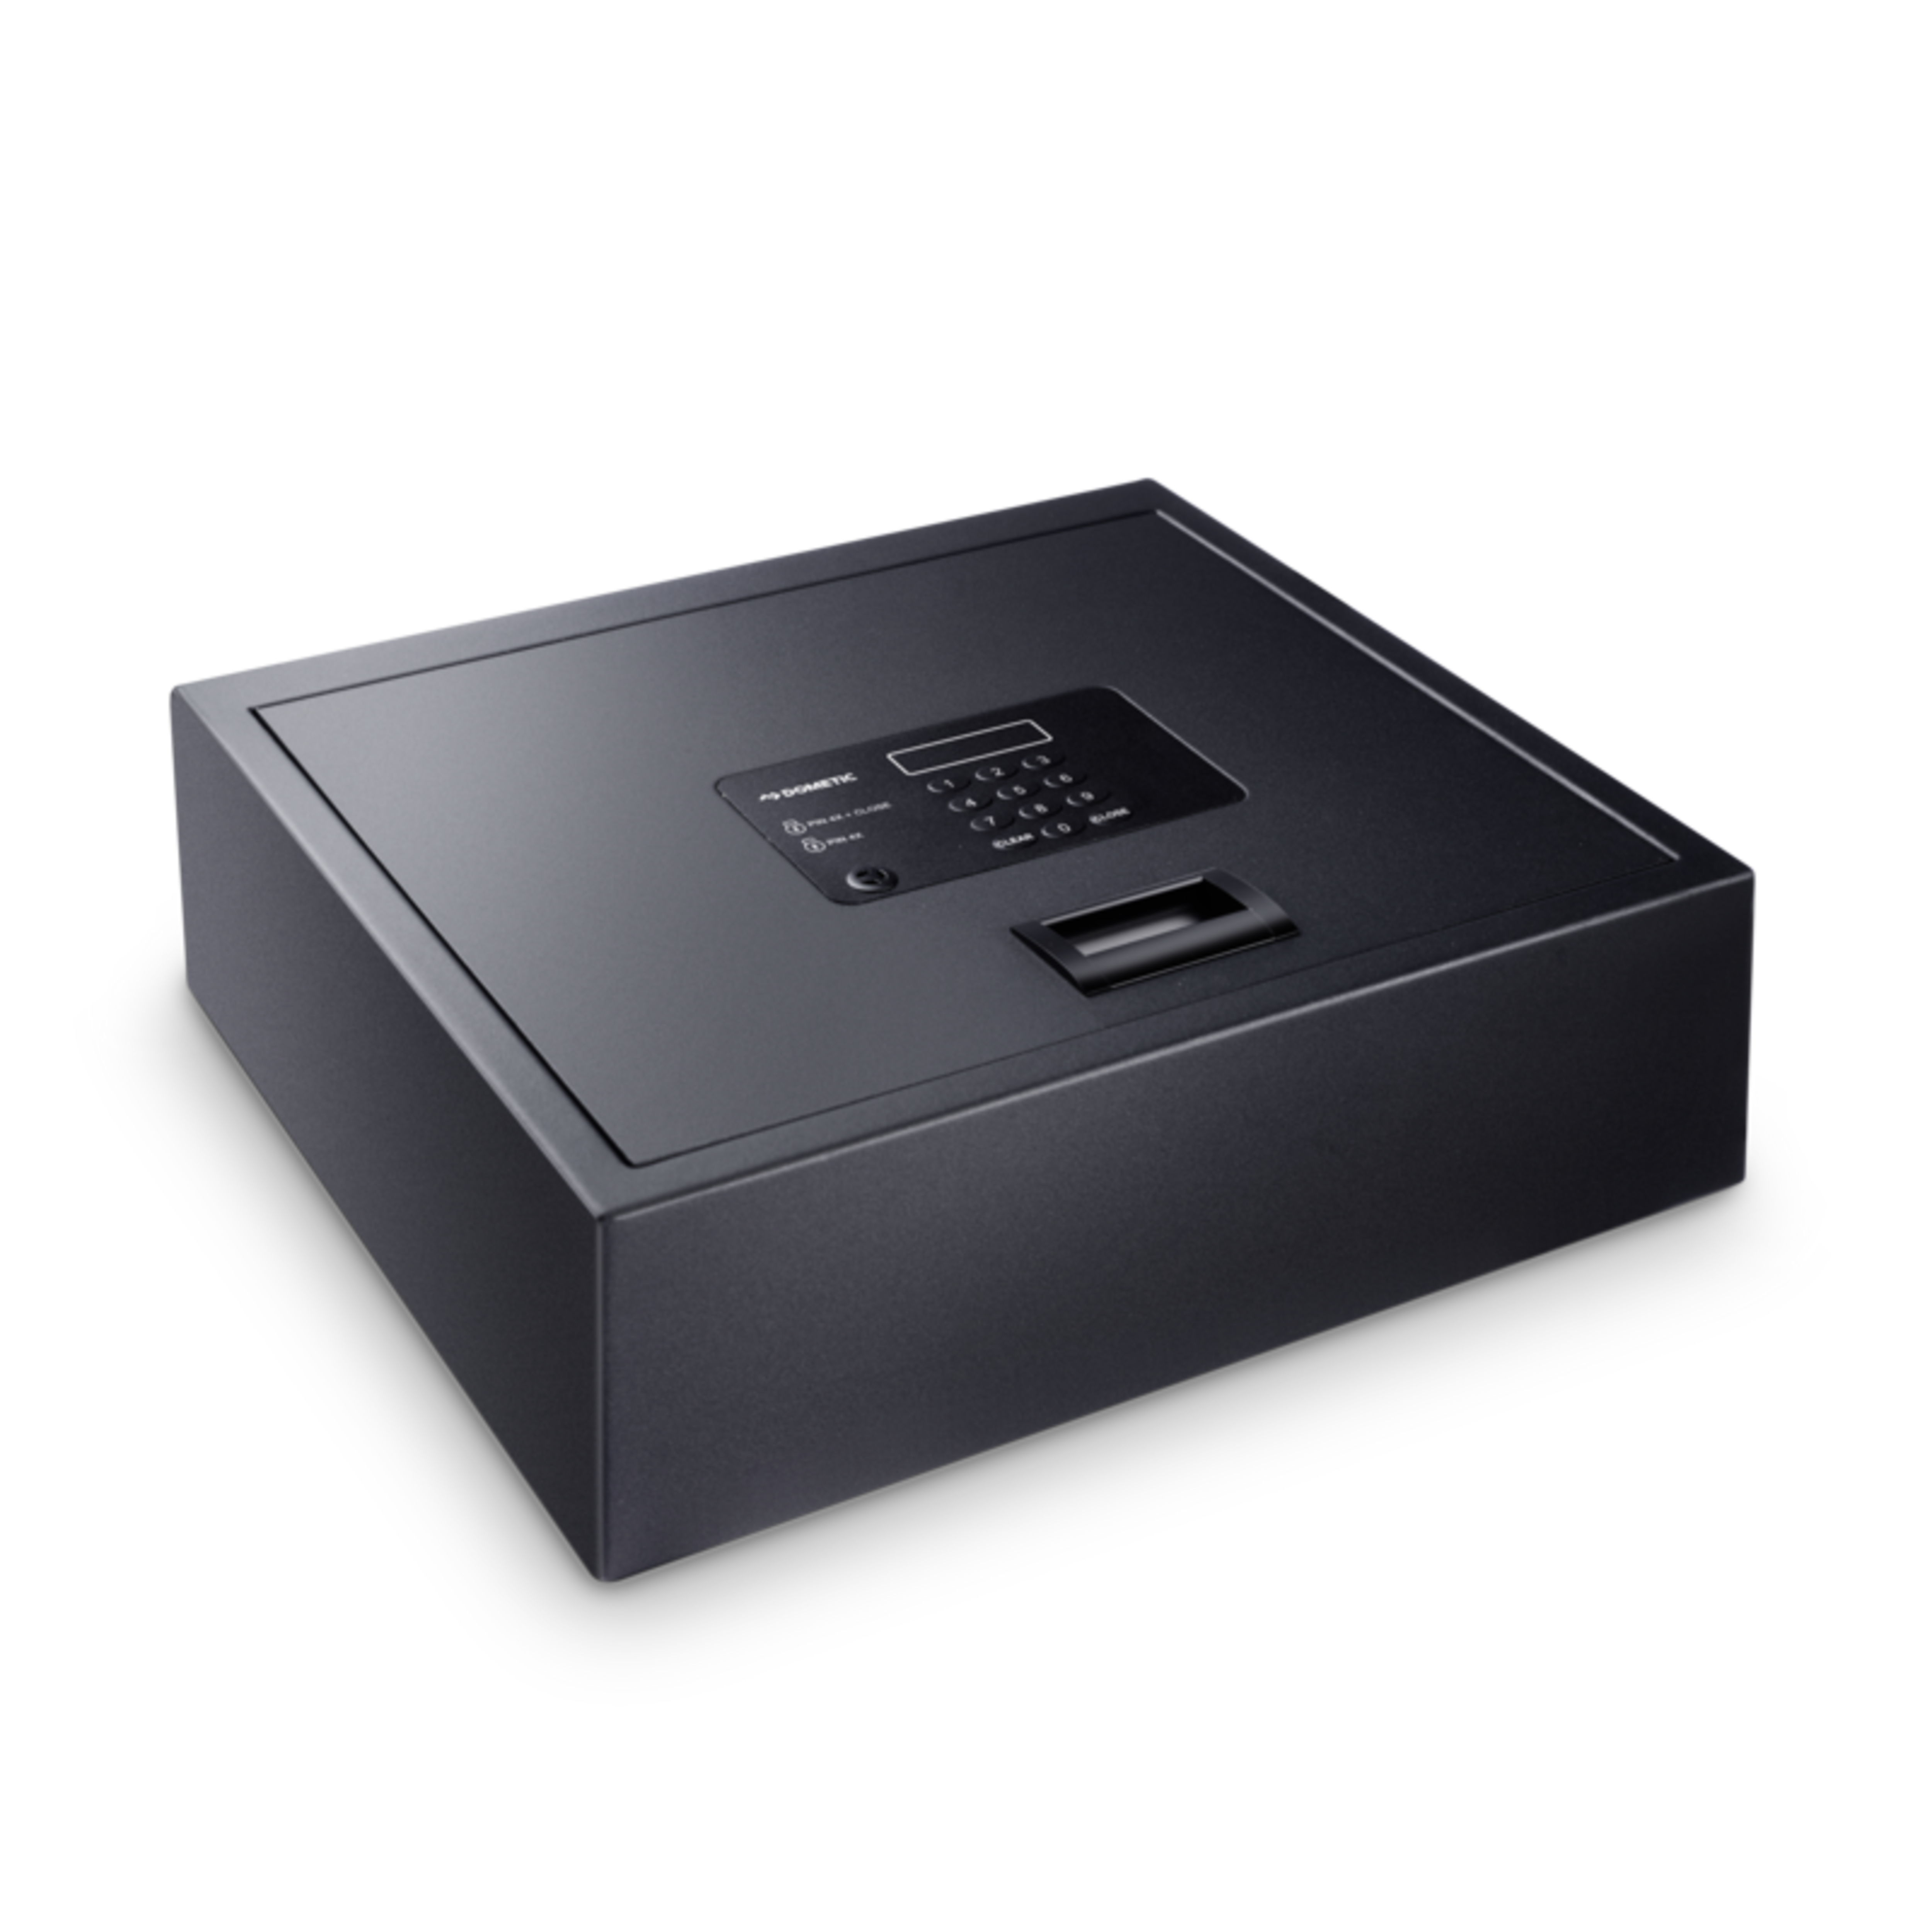 Dometic ProSafe MDT 400X